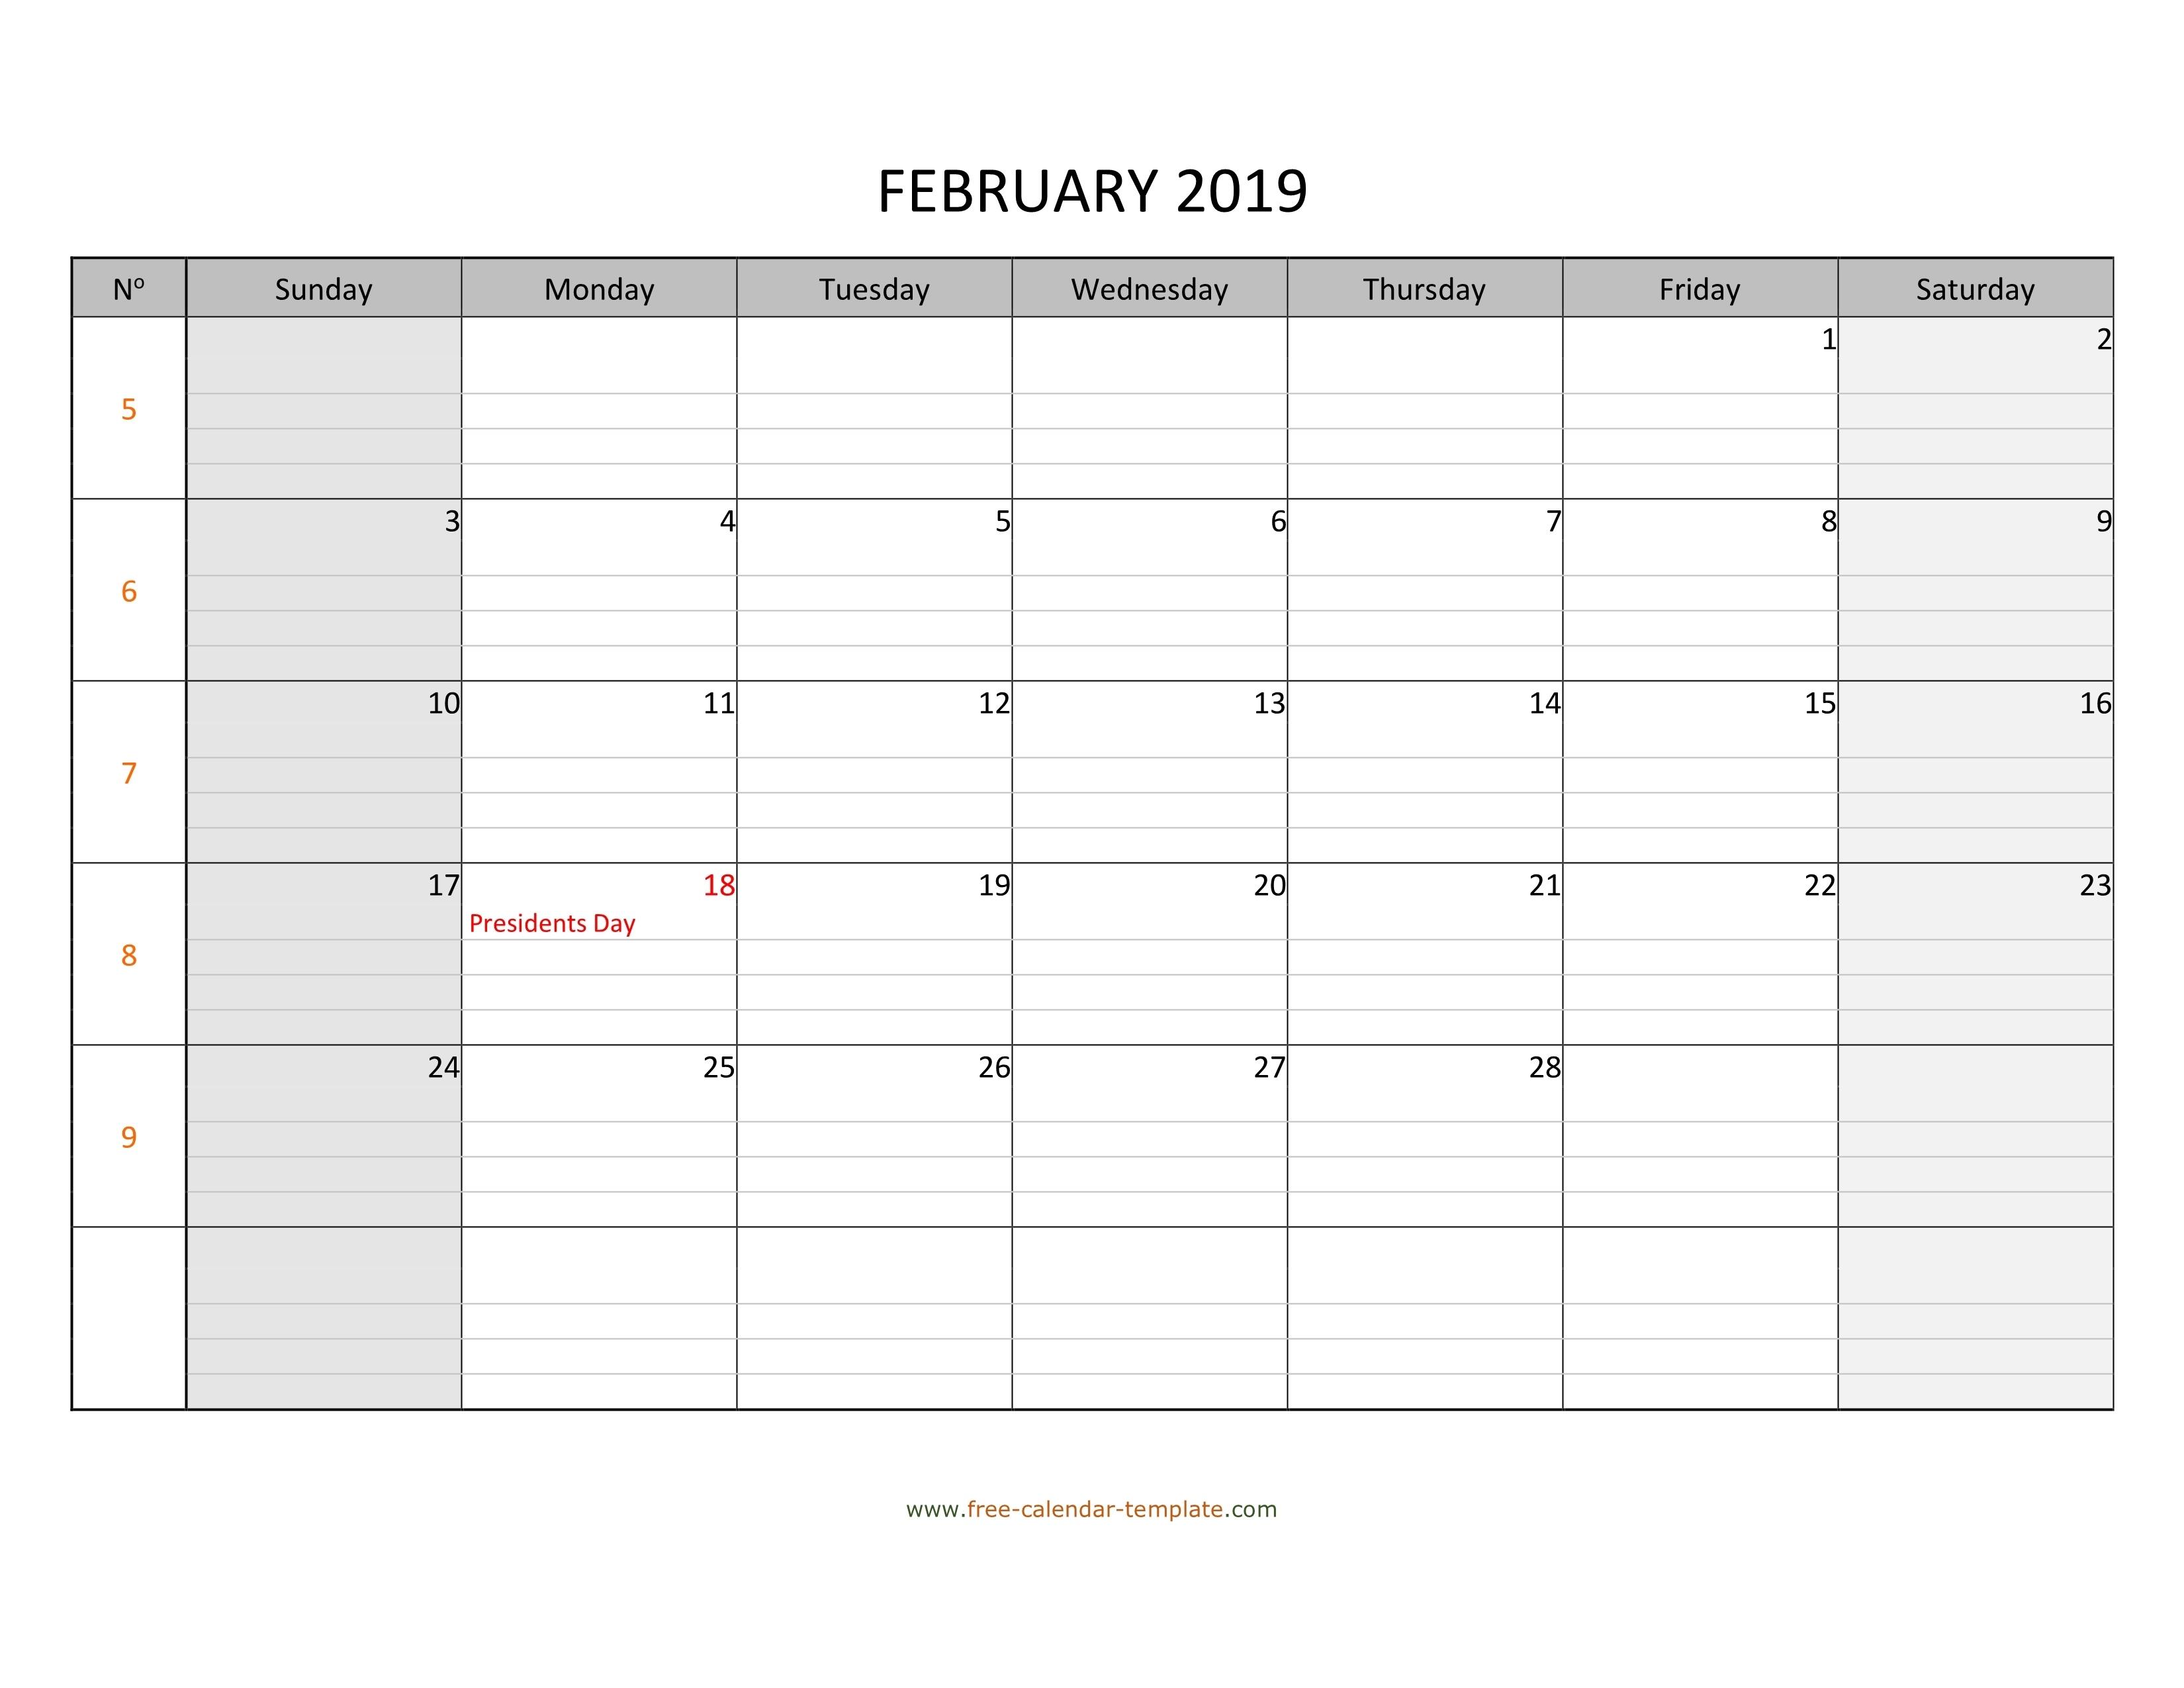 February 2019 Calendar Free Printable With Grid Lines Free Calendar Grid Template